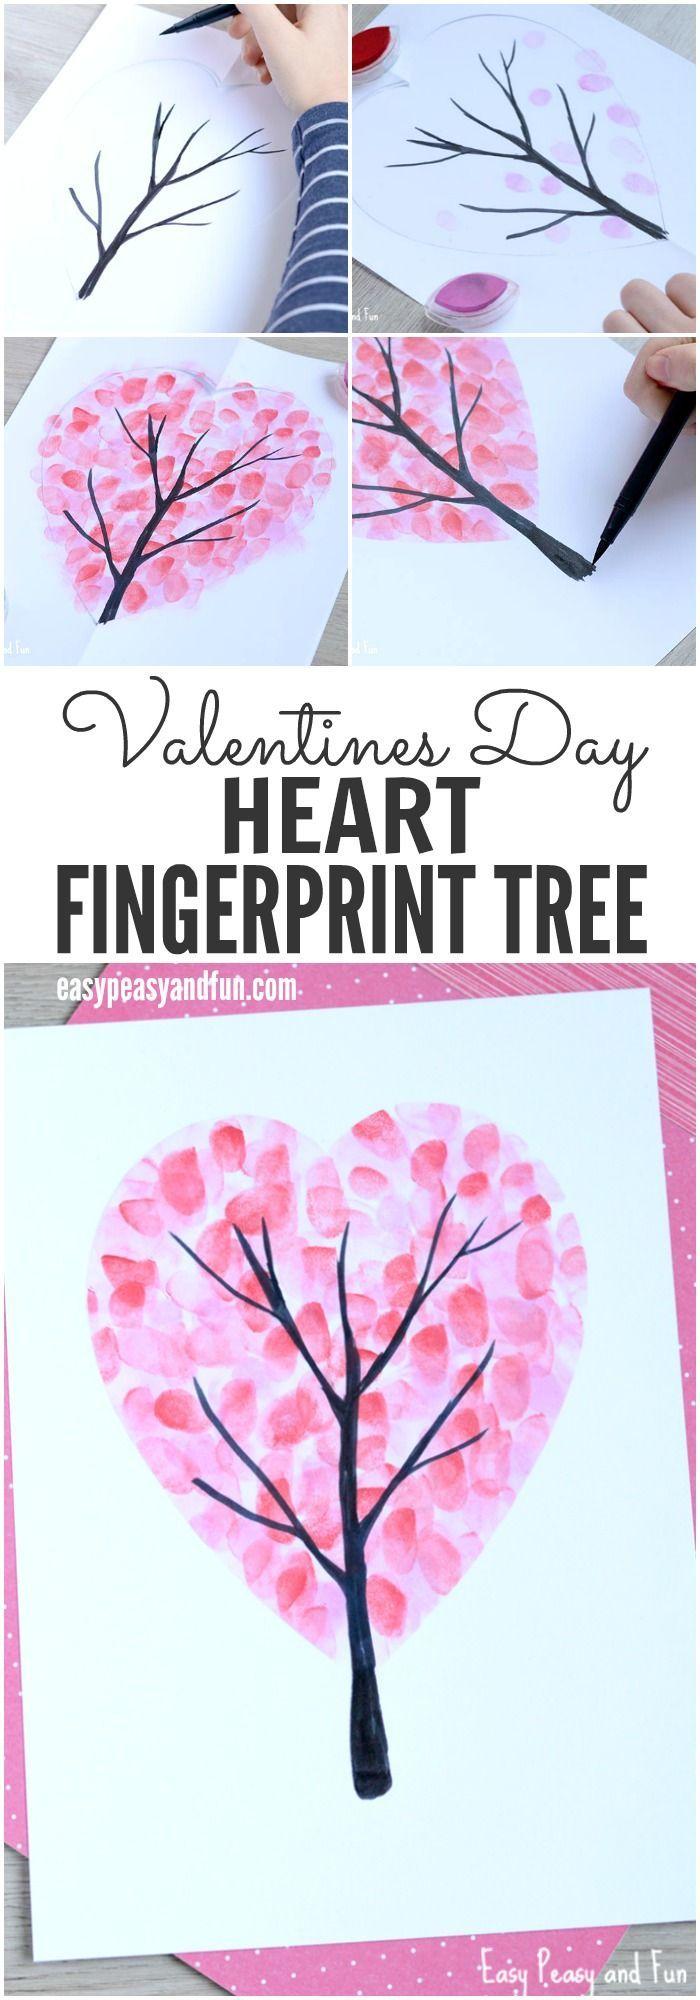 Valentines Day Heart Fingerprint Tree Craft Preschool Pinterest